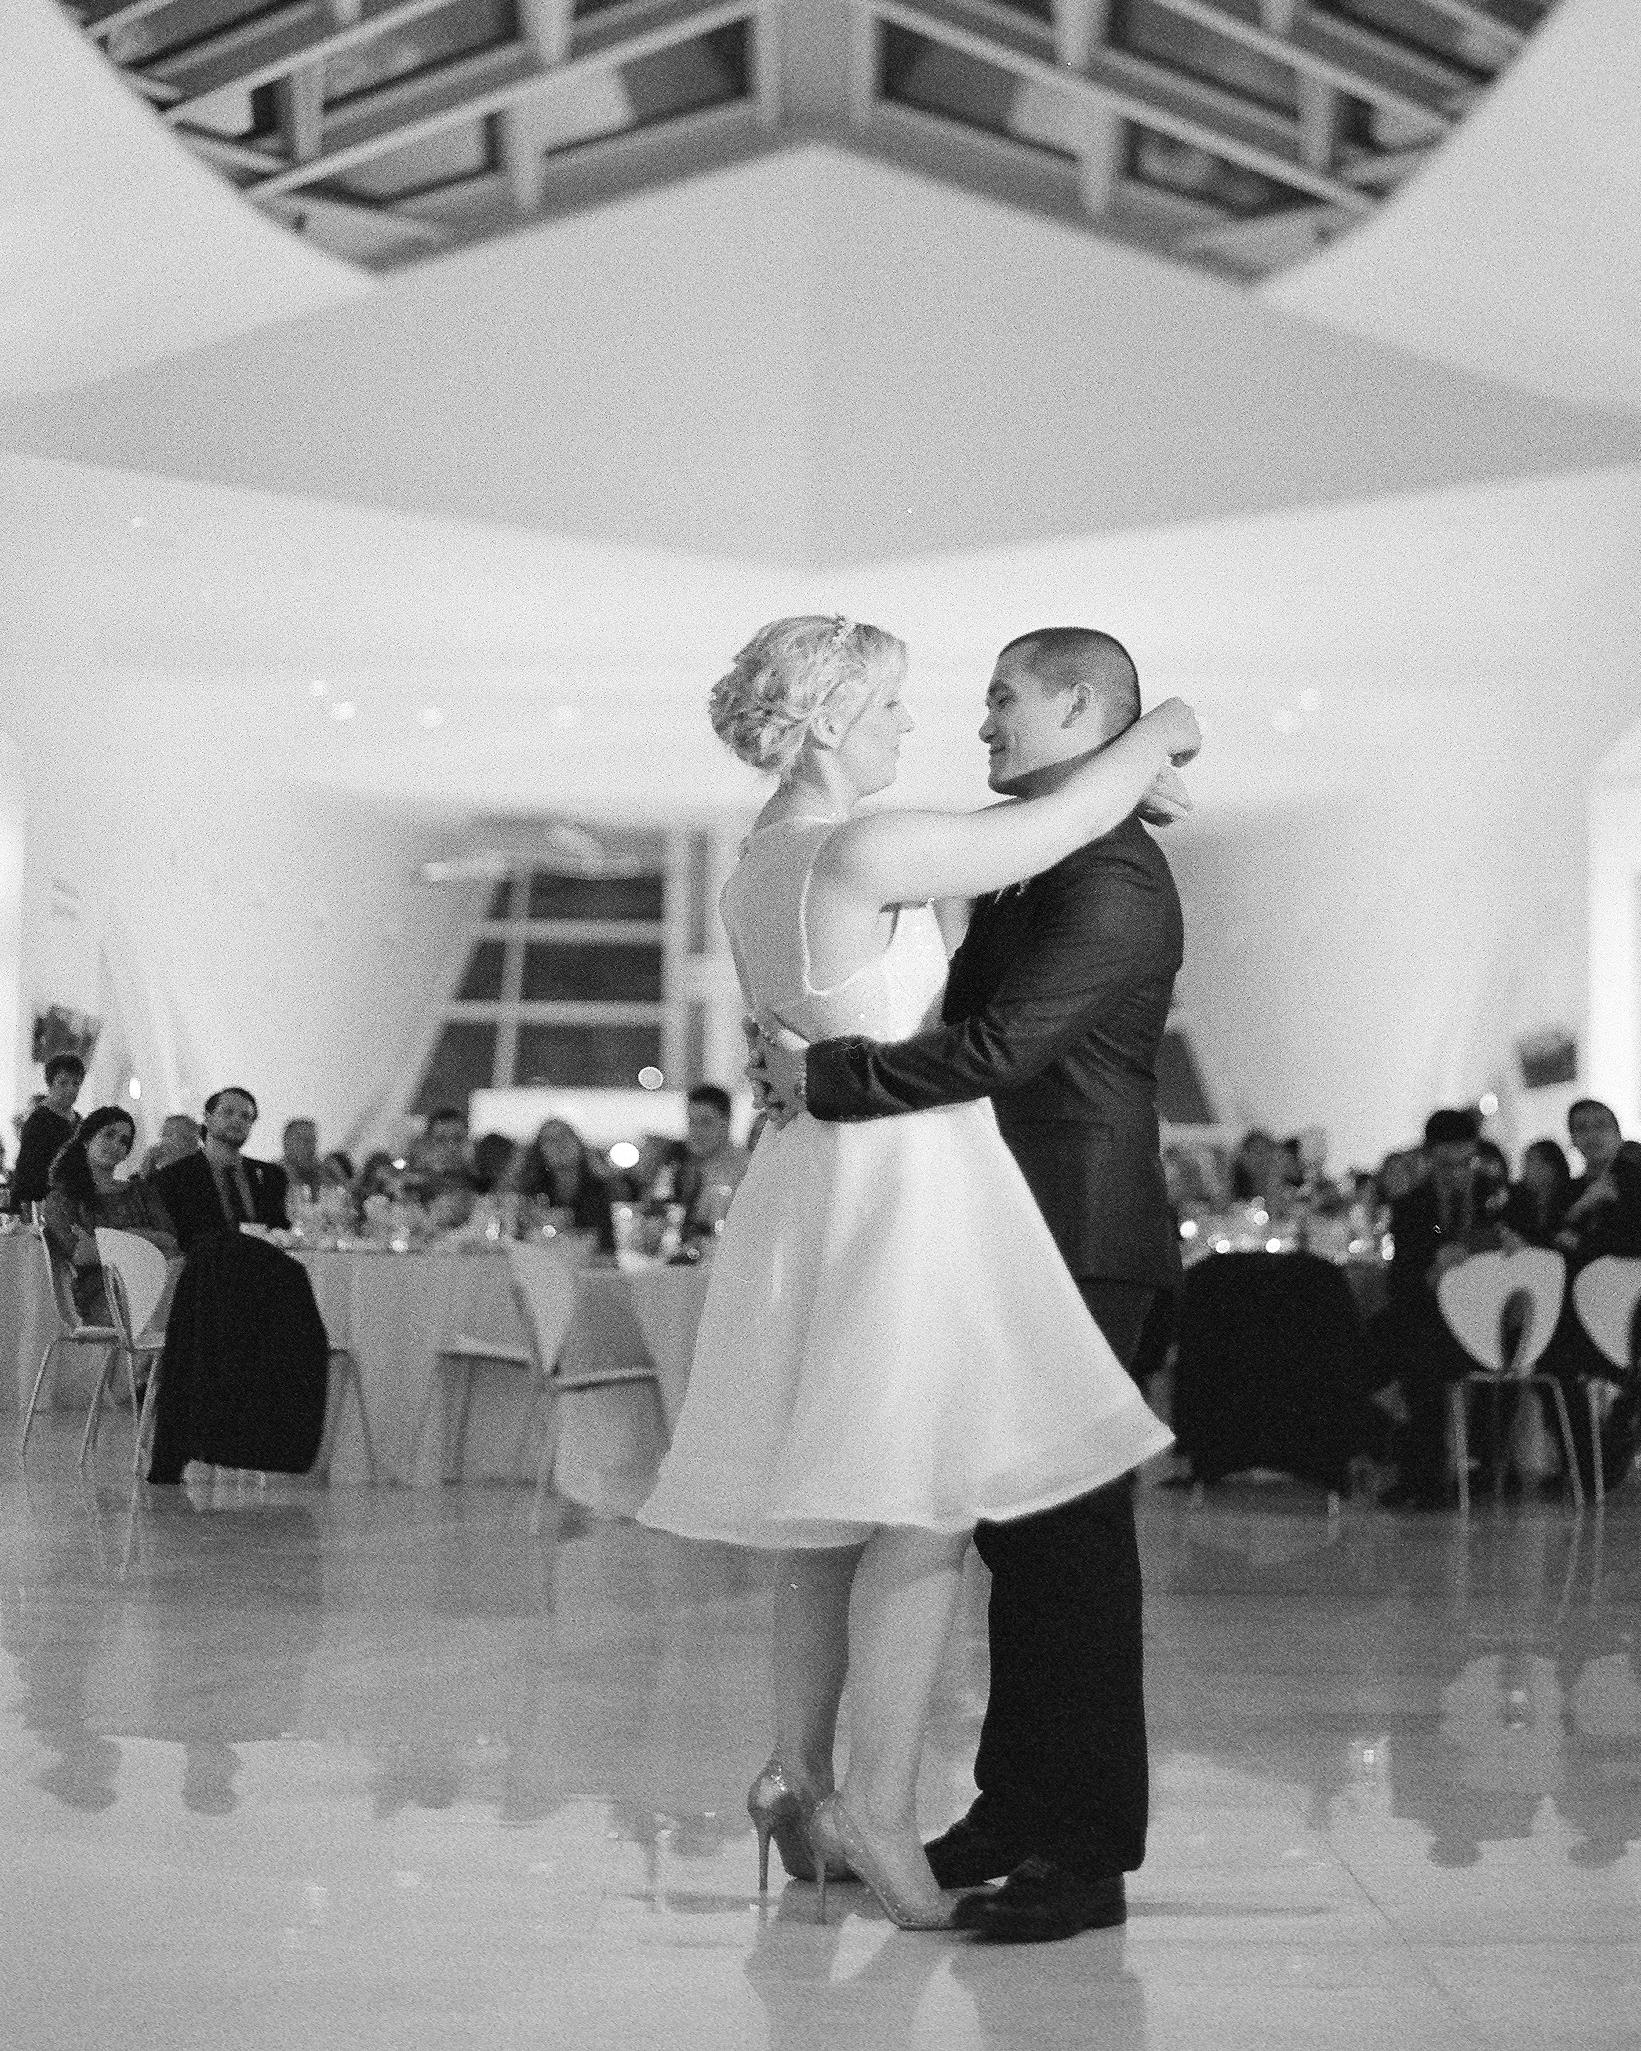 libby-allen-wedding-dad-098-s112487-0116.jpg